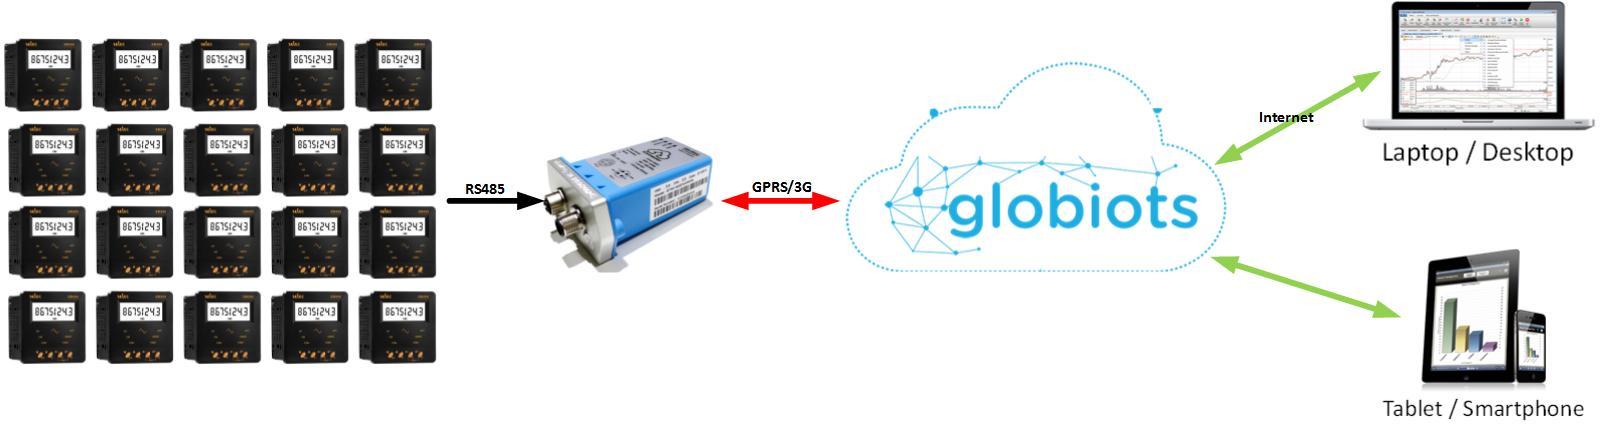 GLOBIOTS-CS-VN-002-H4